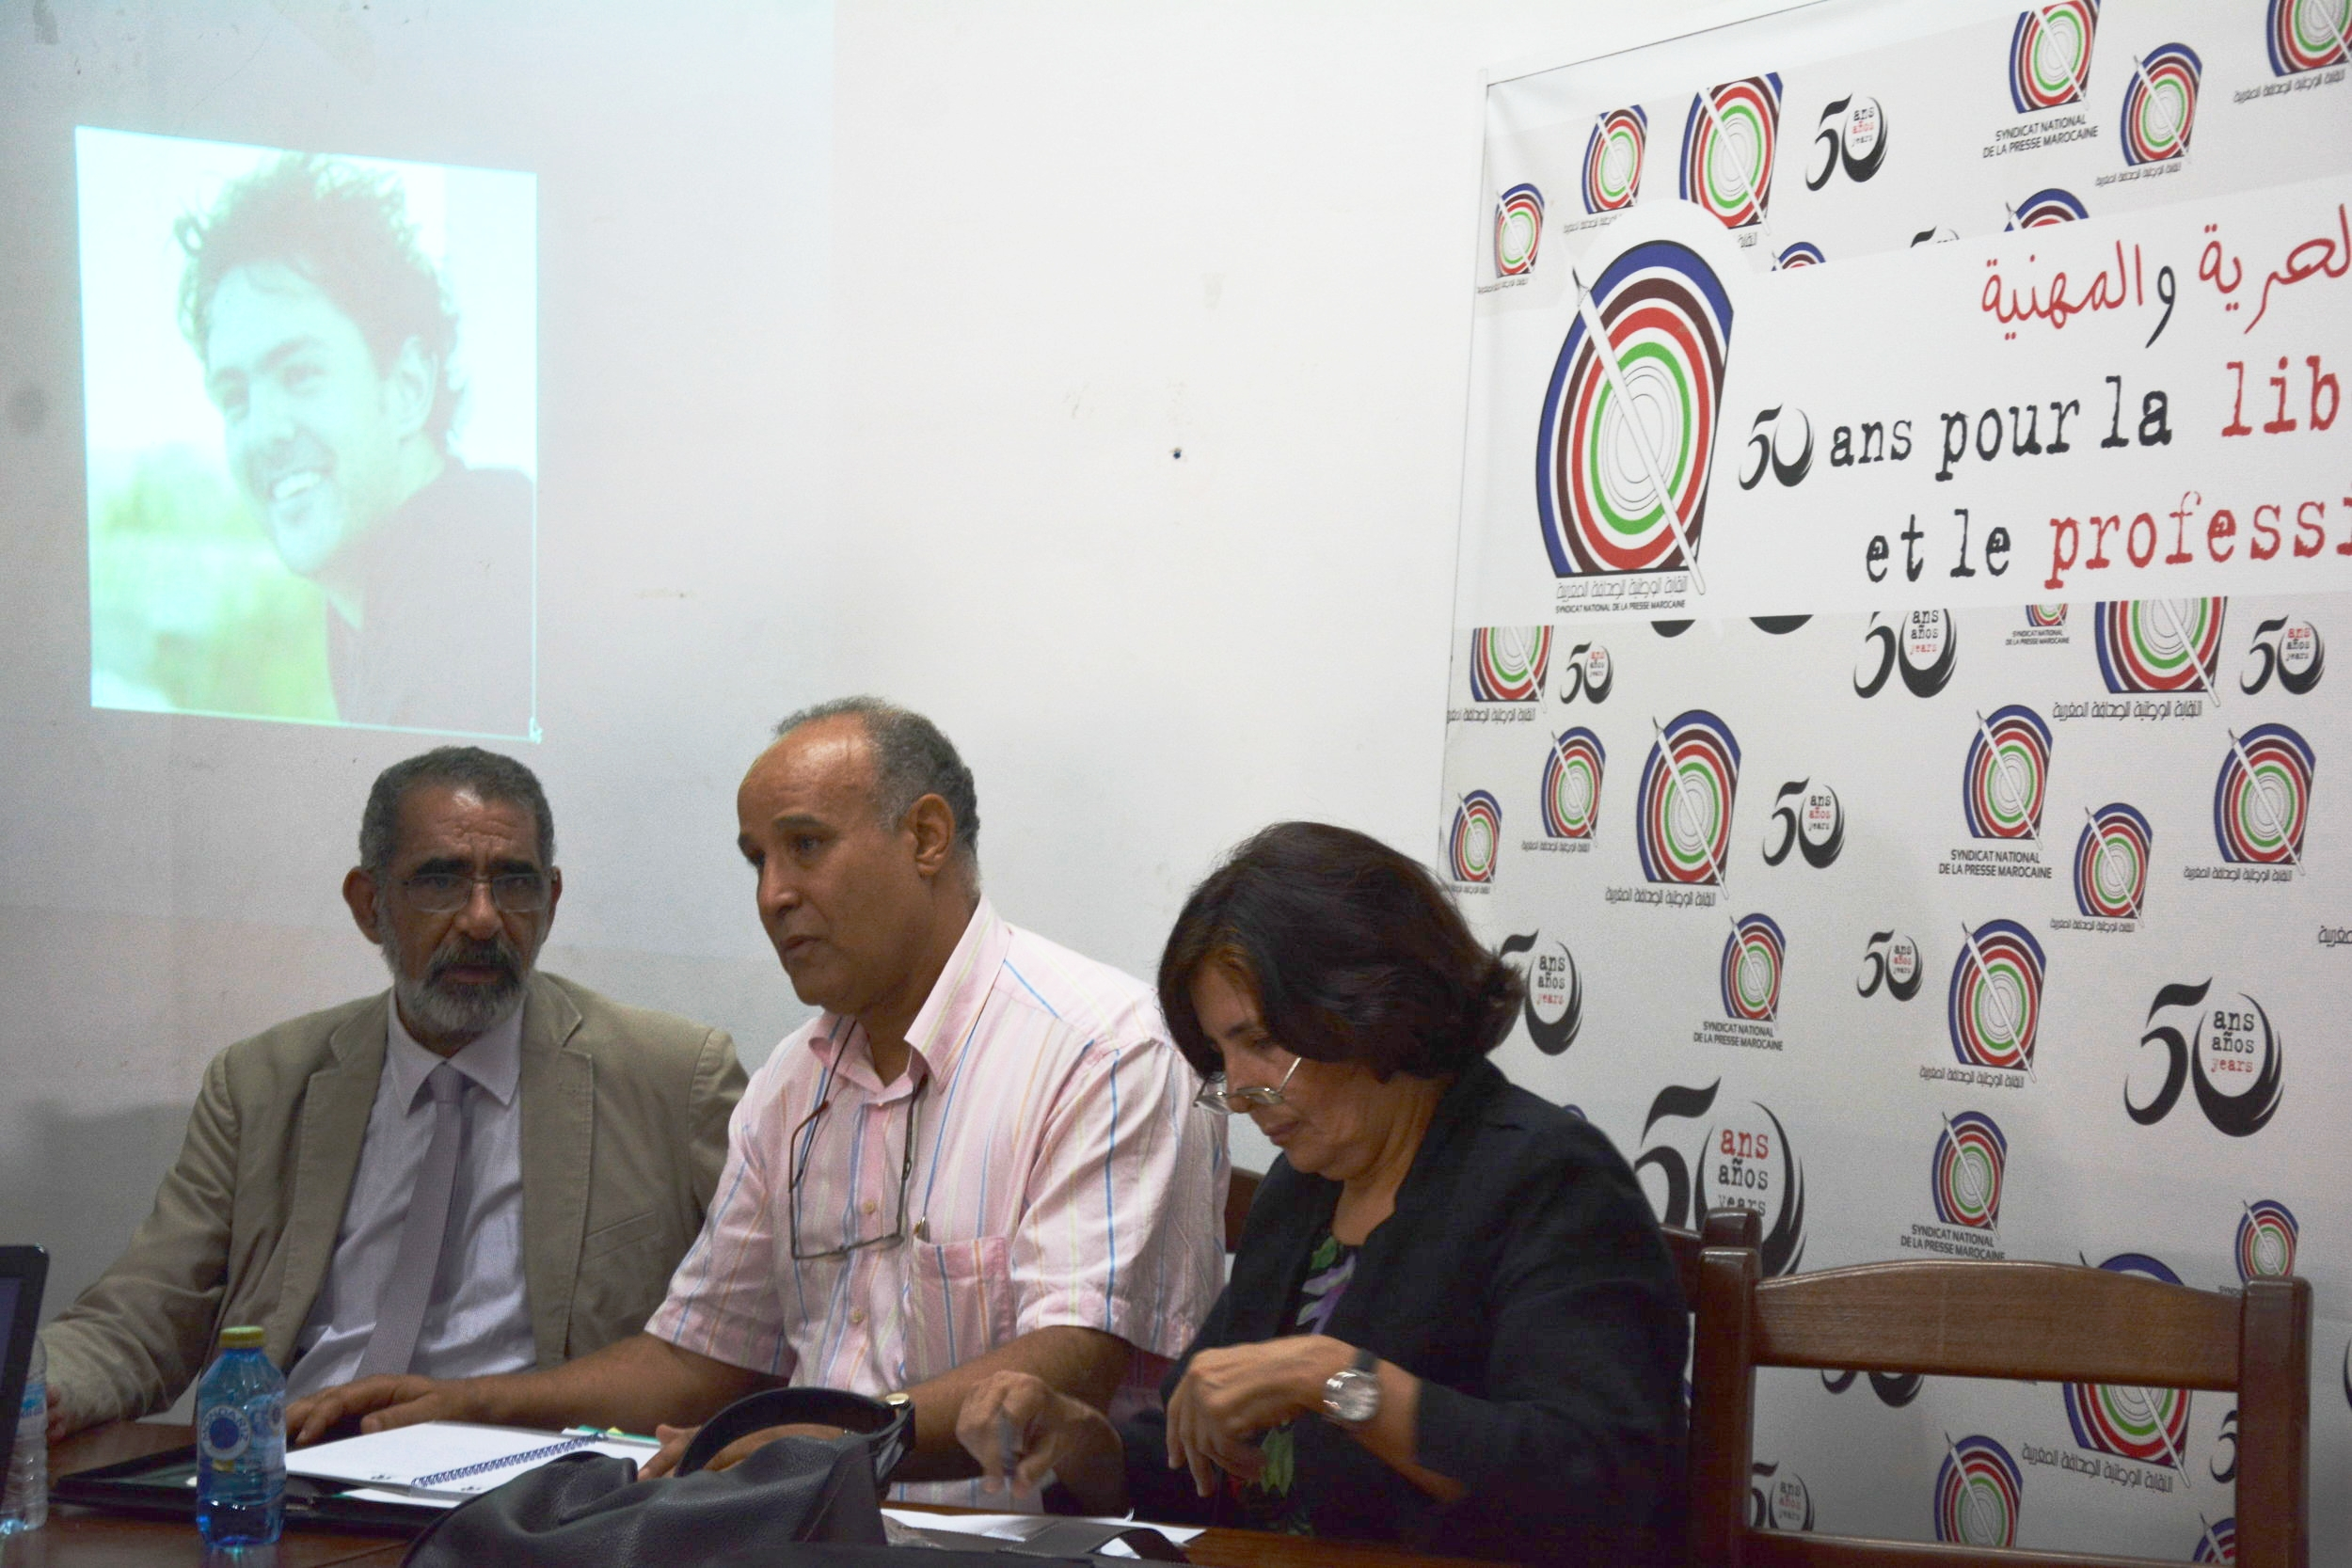 Representatives of the civil society at the September 2014 press conference